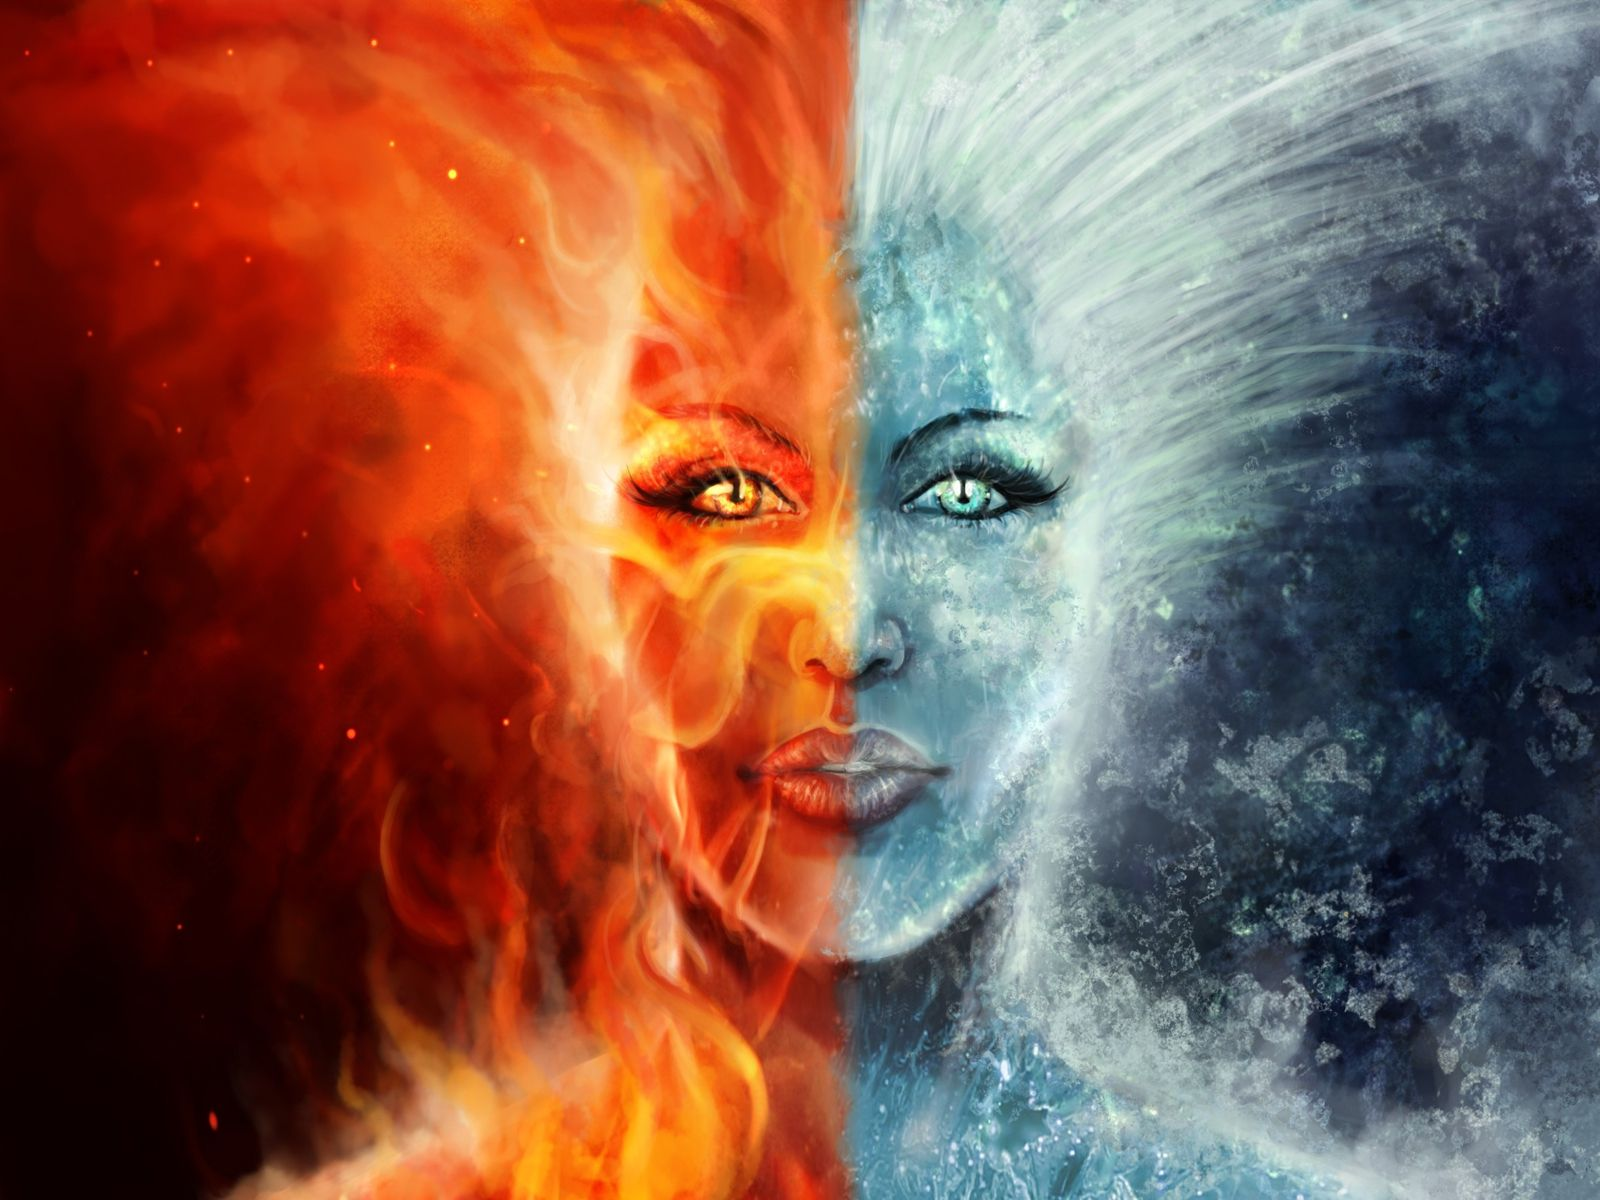 CRPS fire and ice! | CRPS Awareness | Pinterest | Crps ...